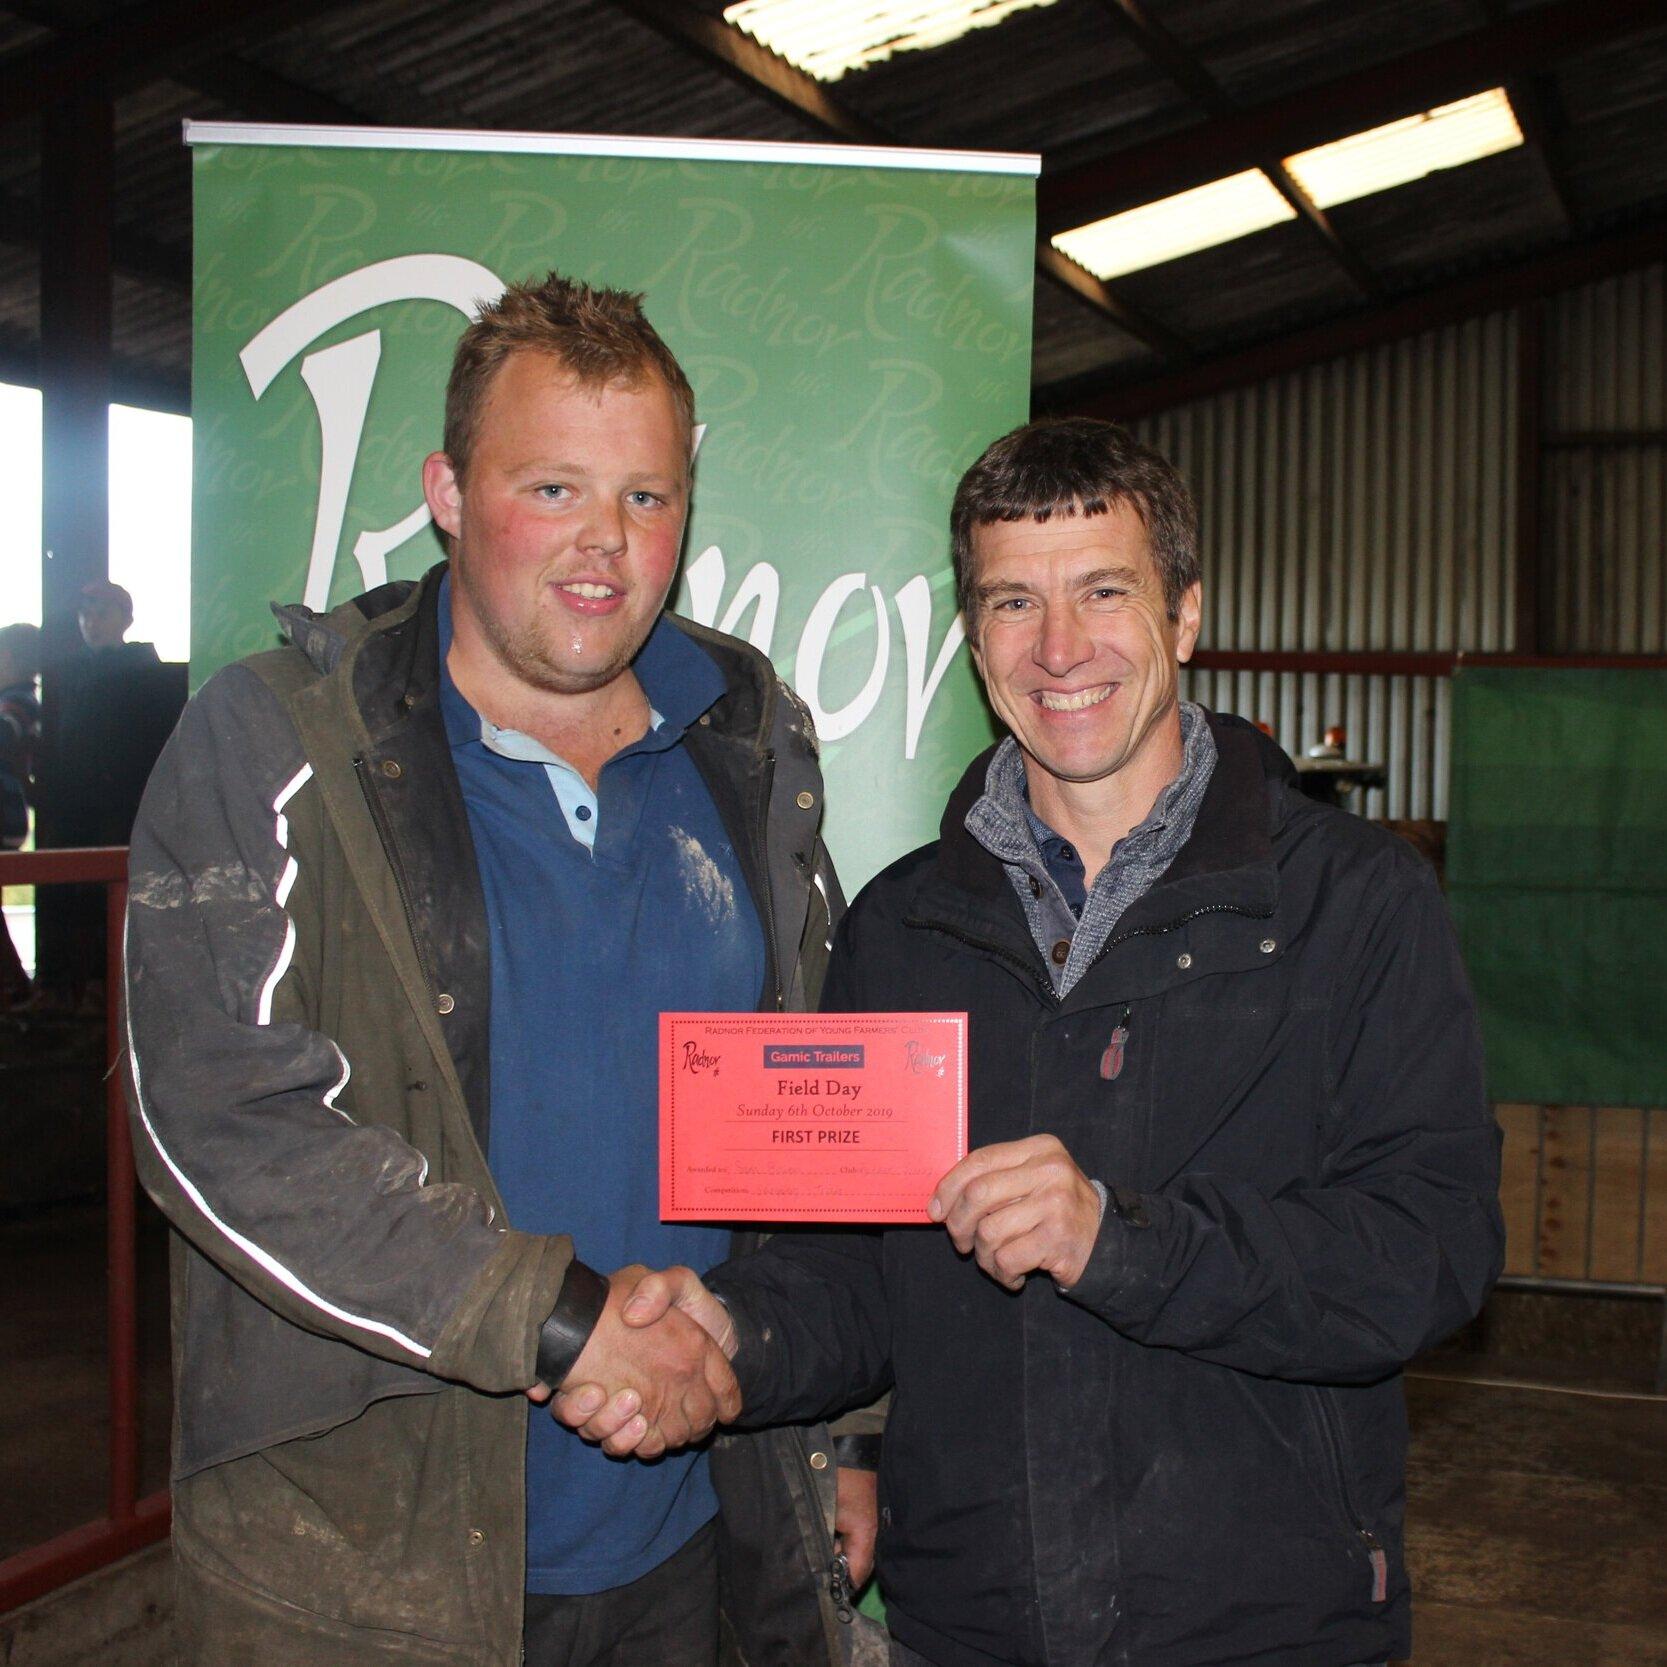 Sam Bowen, Radnor Valley YFC - 1st place in the Sheepdog Trials with Mark Watson